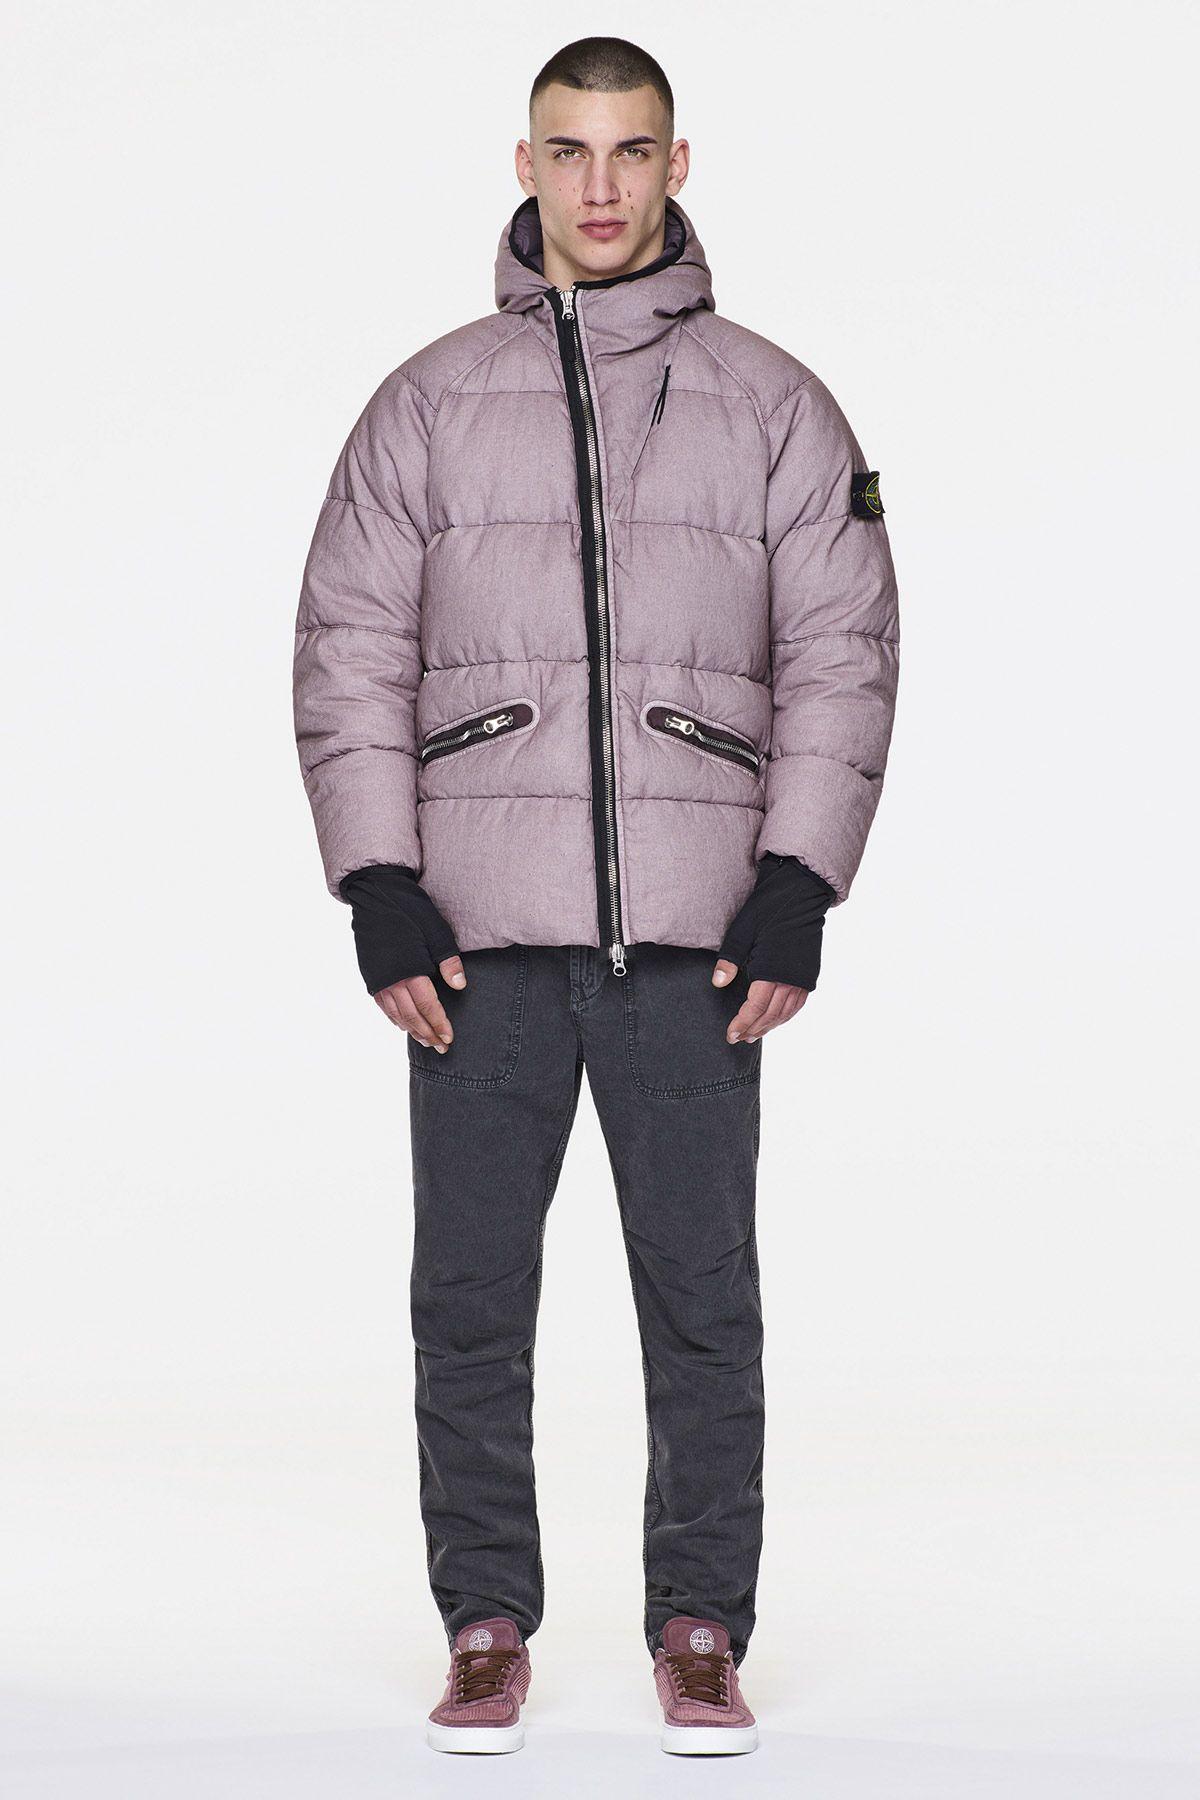 6915 Stone Island Aw 018 019 Lookbook Www Stoneisland Com Outdoor Fashion Windbreaker Jacket Winter Jackets [ 1800 x 1200 Pixel ]